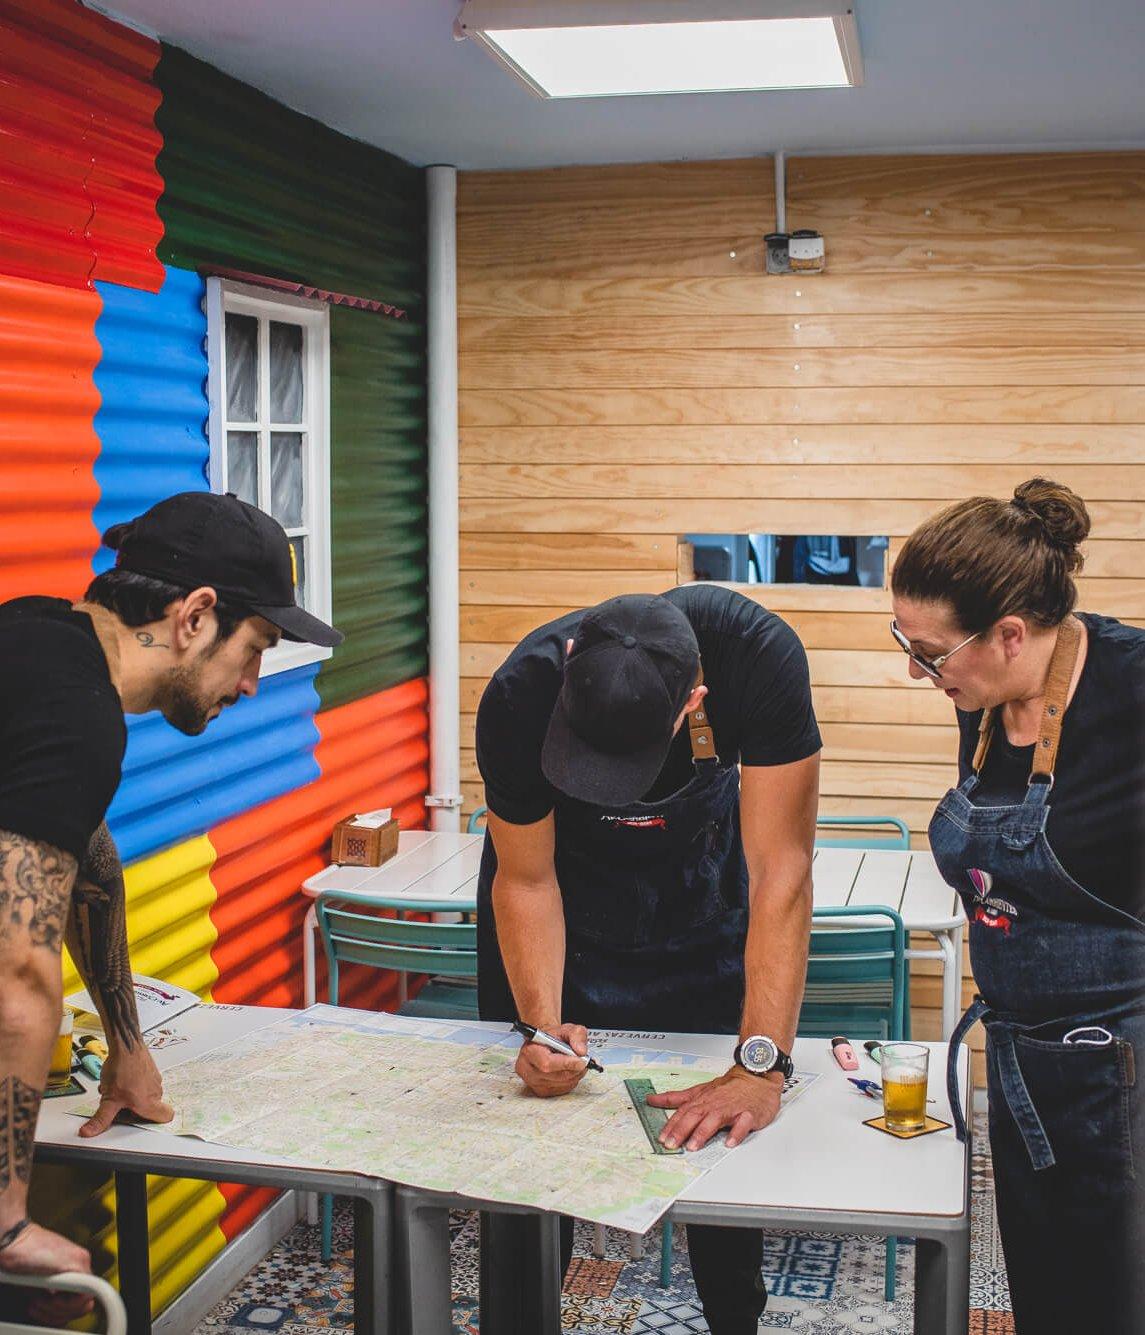 Pedidos | Pizzería Av. Corrientes | Pizzería Argentina en Barcelona